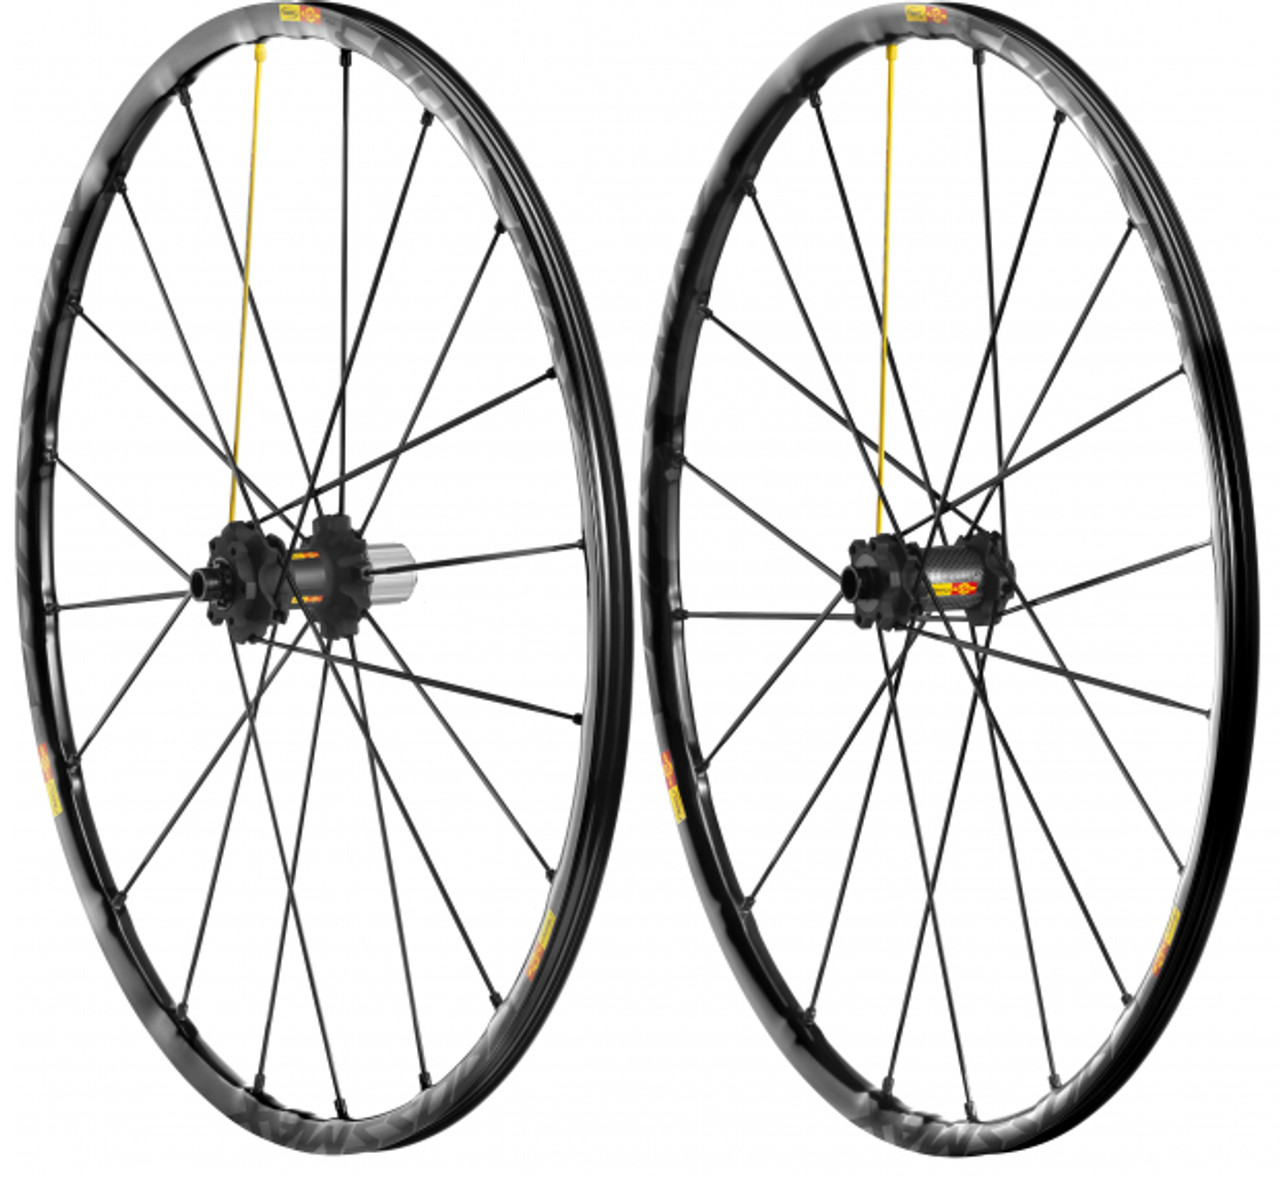 d956426171b Texas Cyclesport Mavic Crossmax SL Pro 29